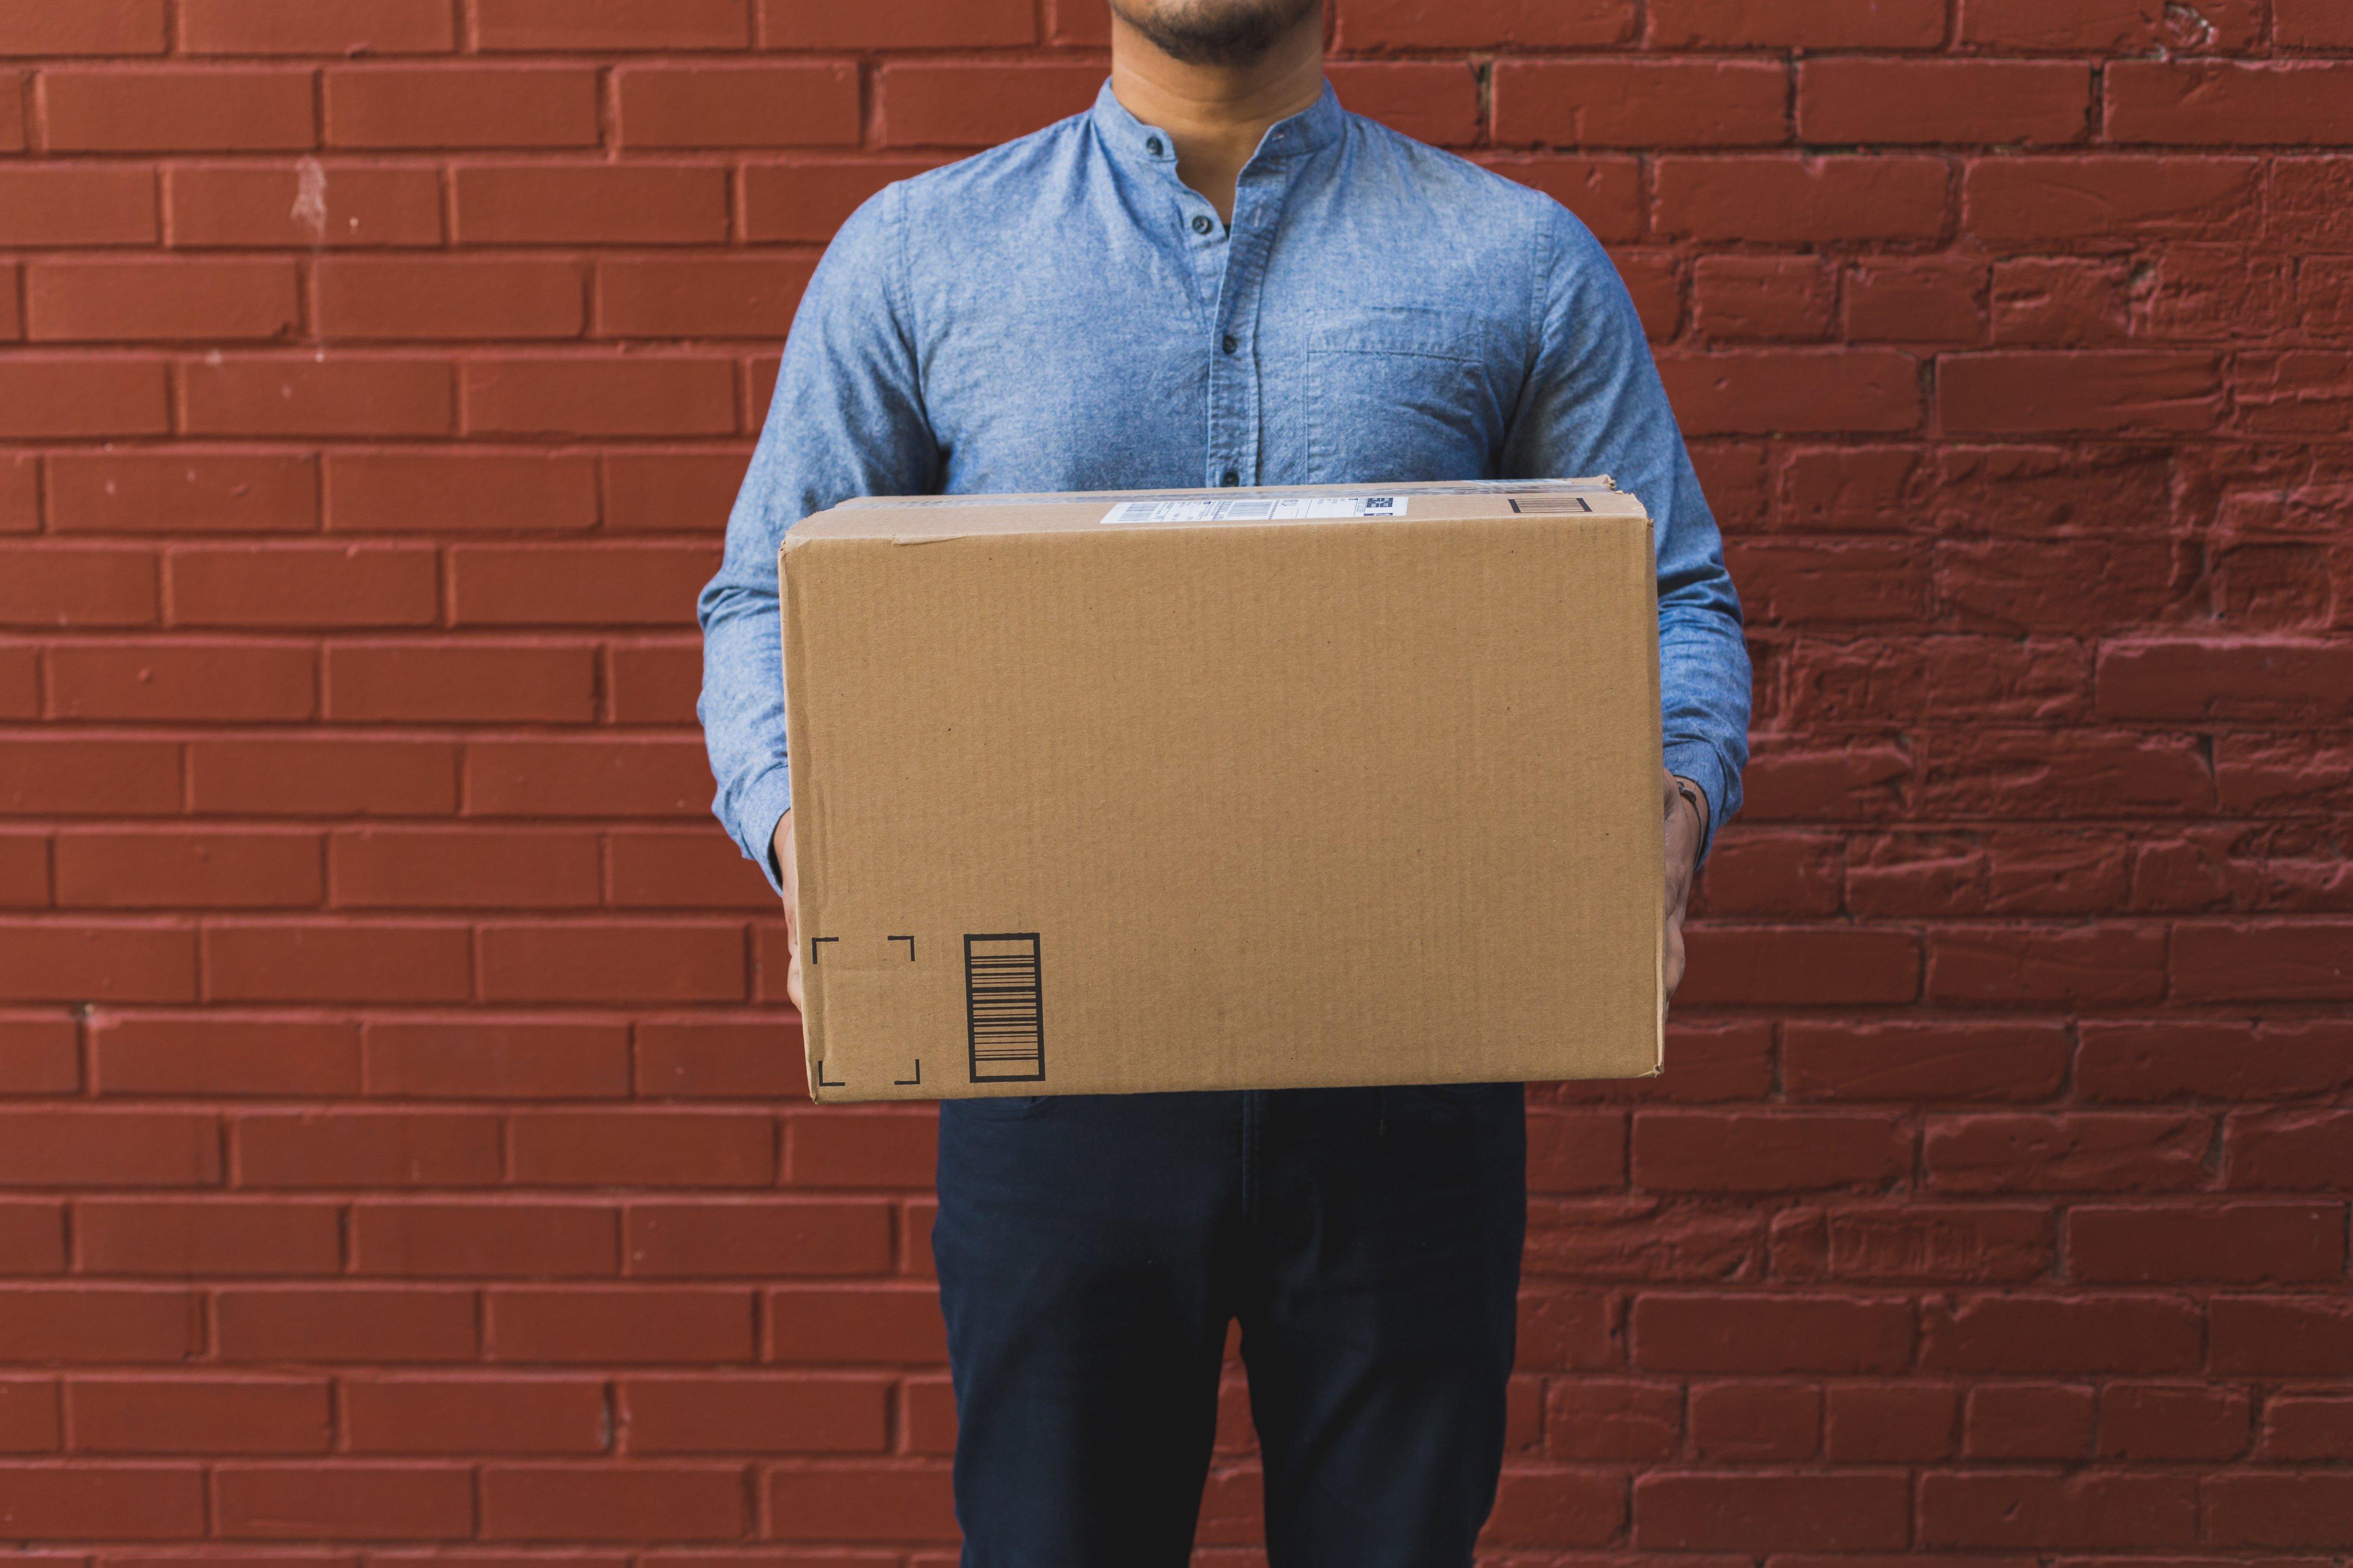 man-holding-shipping-box- ShipBob fulfillment software 3PL provider